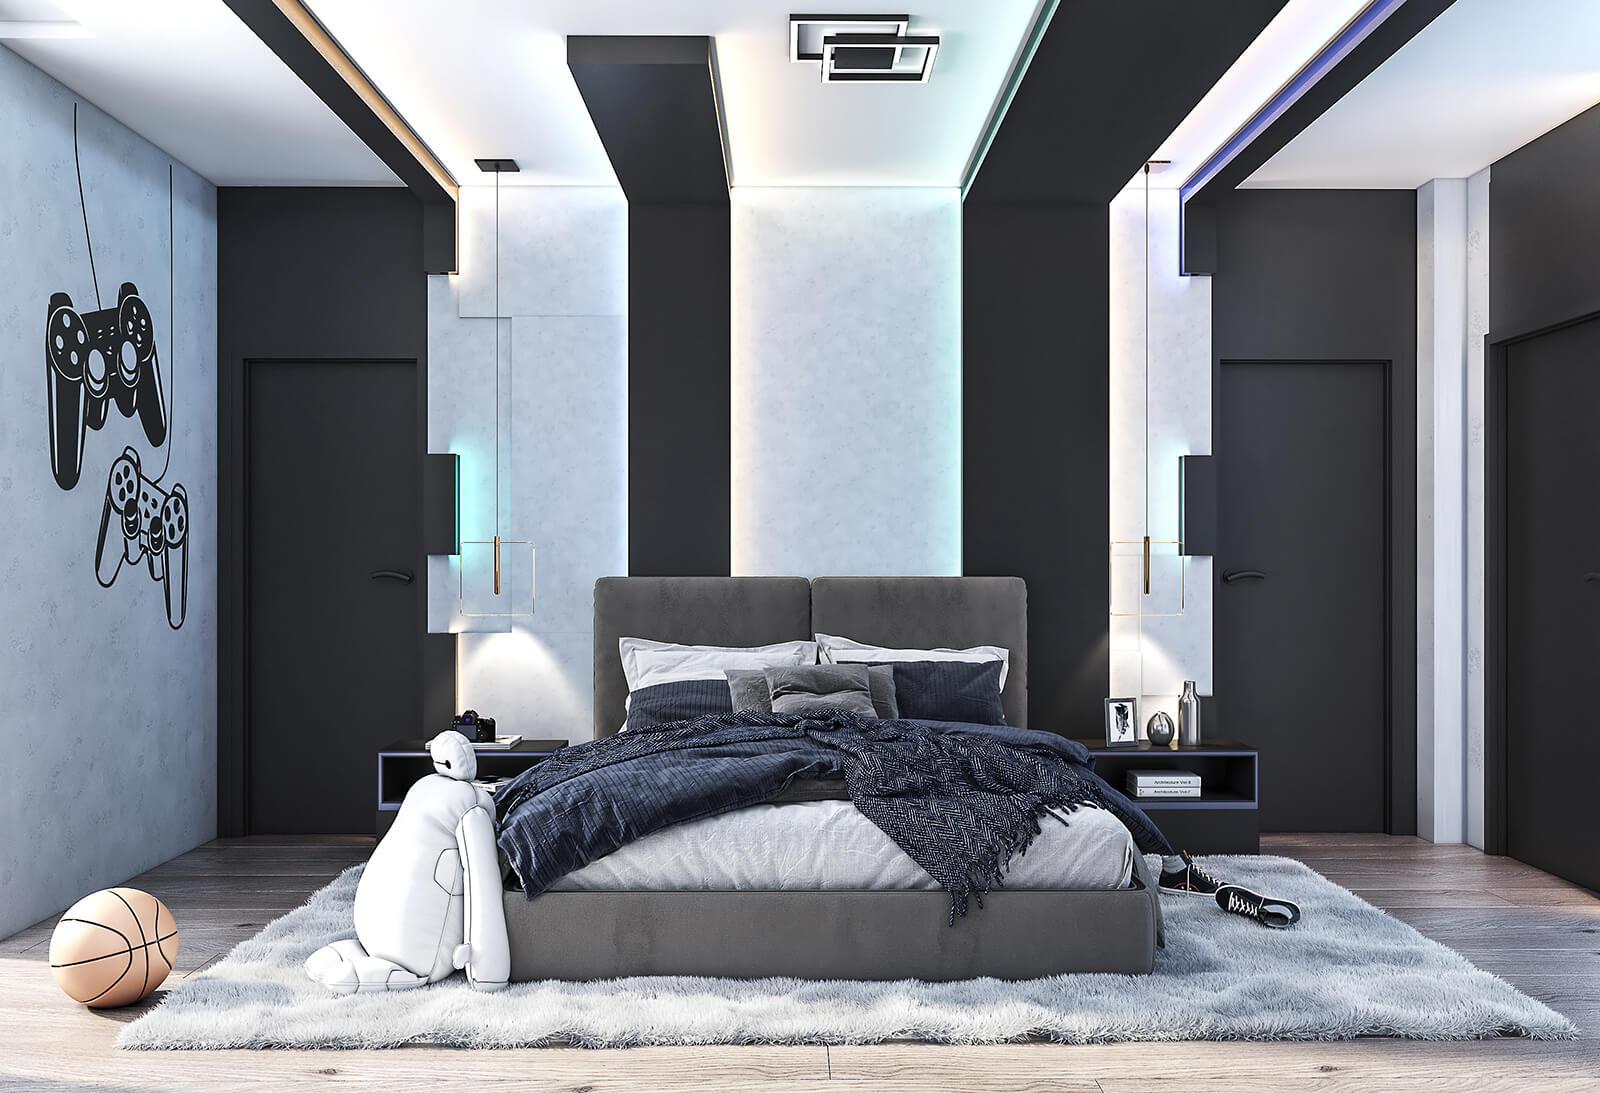 interioren-dizain-proekt-na-mladejka-staya-1